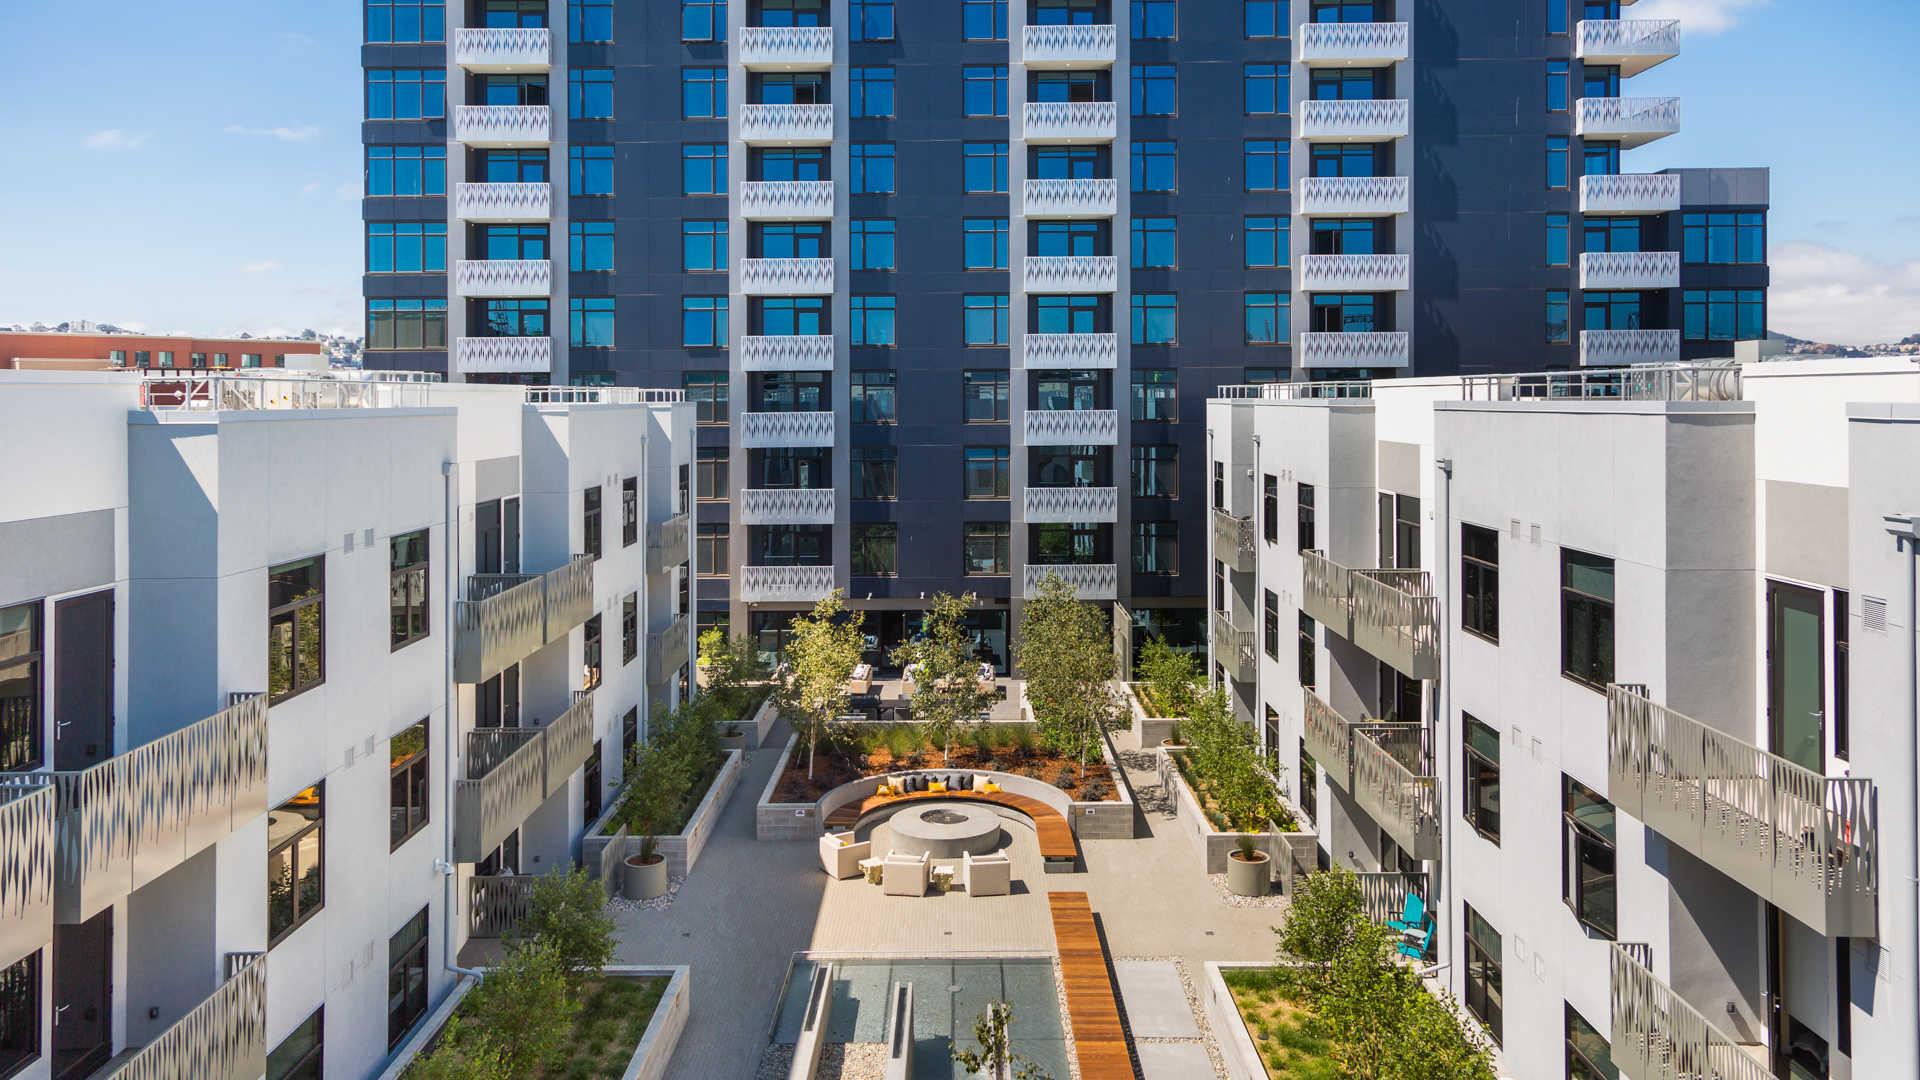 Azure Apartments   Mission Bay, San Francisco   690 Long Bridge Street |  EquityApartments.com